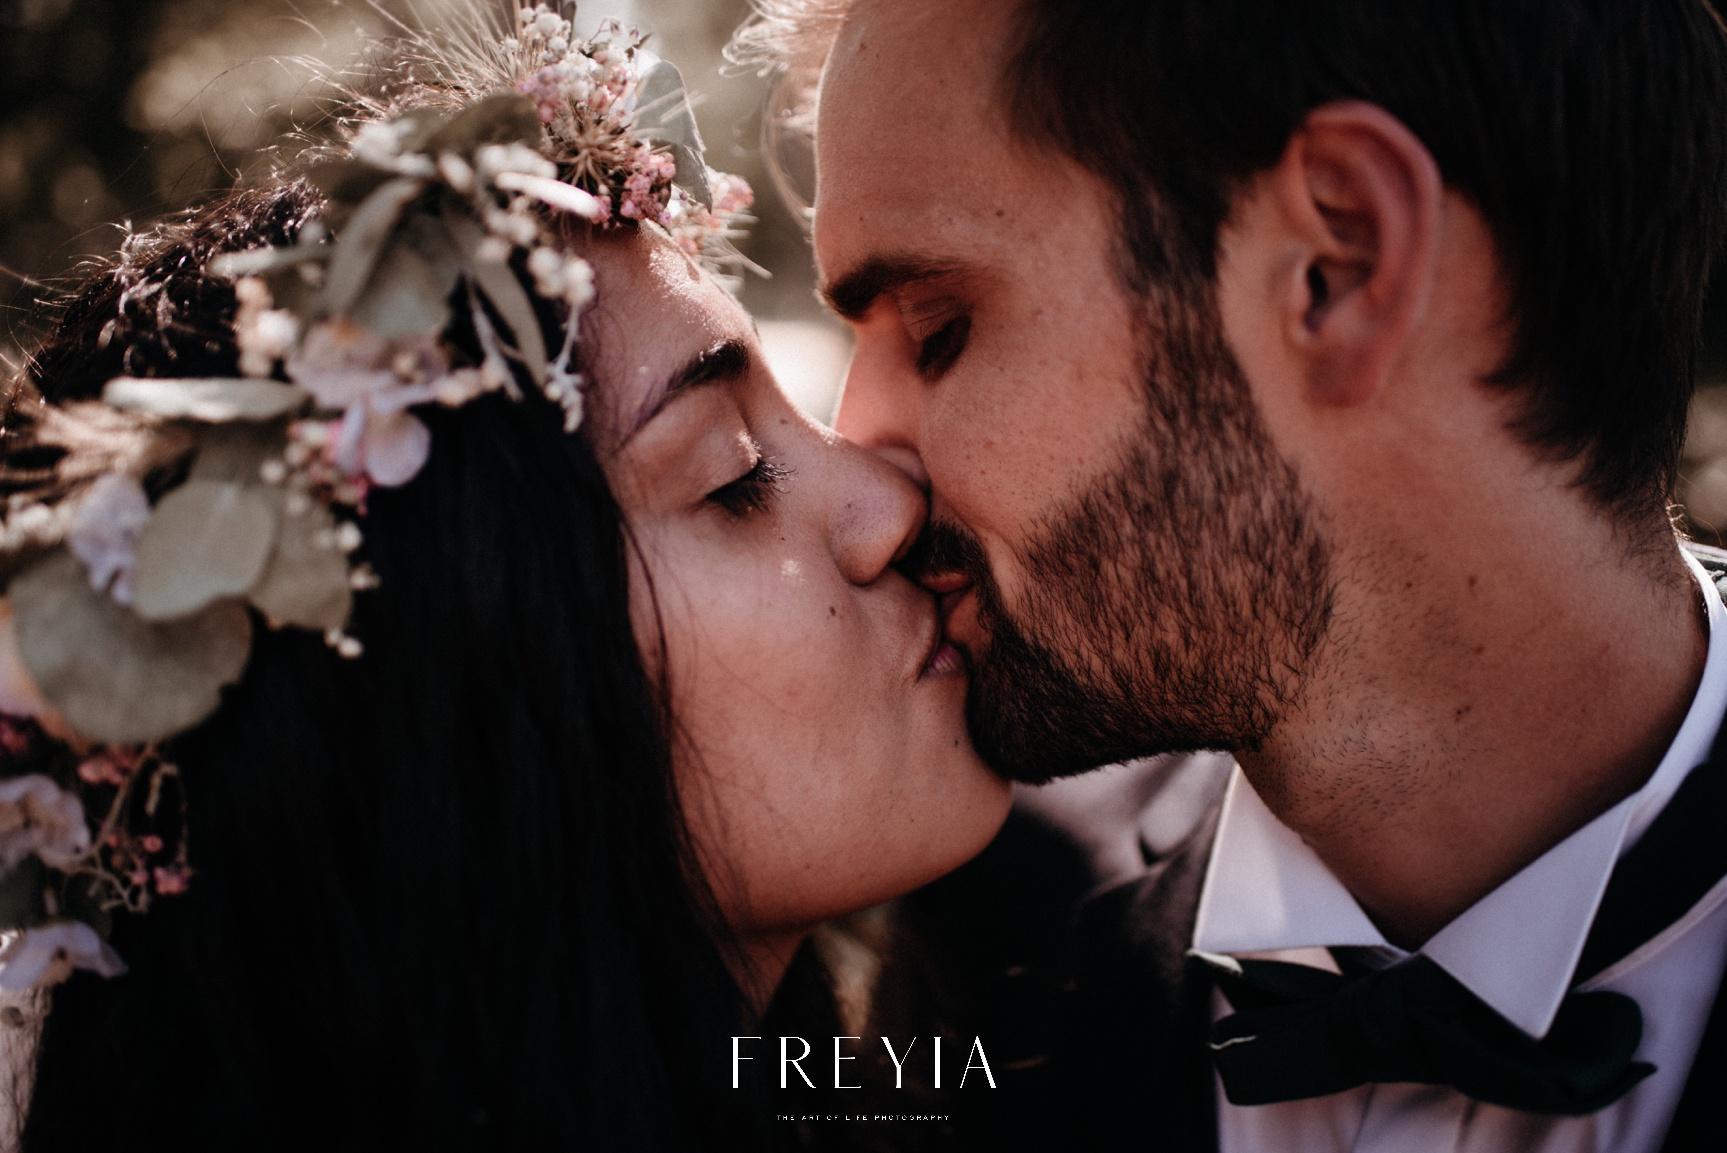 R + T |  mariage reportage alternatif moody intime minimaliste vintage naturel boho boheme |  PHOTOGRAPHE mariage PARIS france destination  | FREYIA photography_-242.jpg